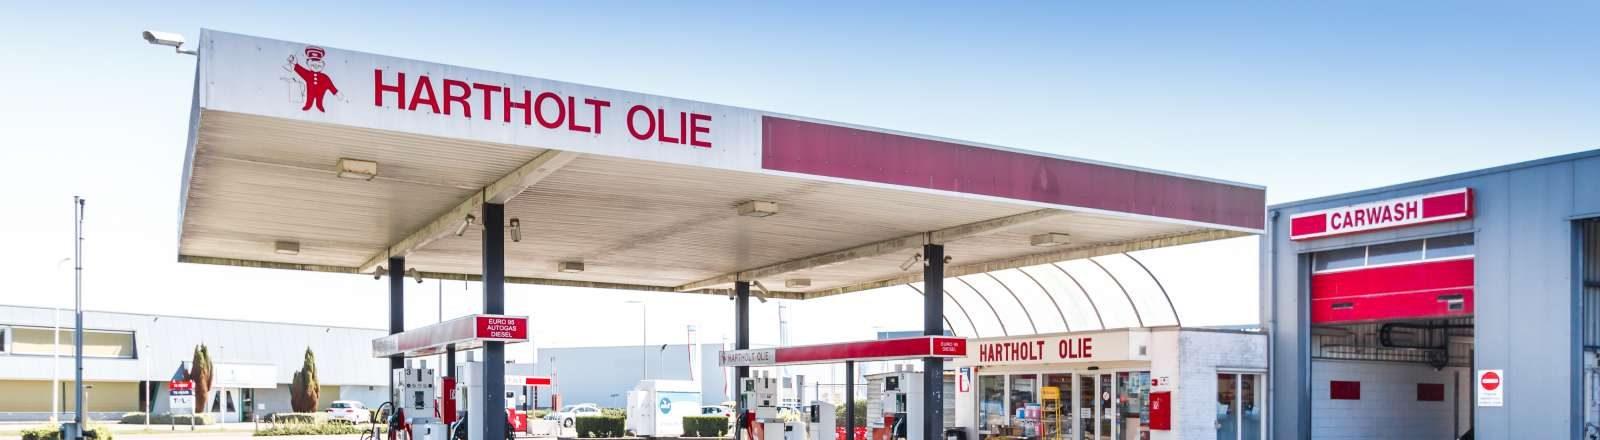 Hartholt Olie Tankstation Heino